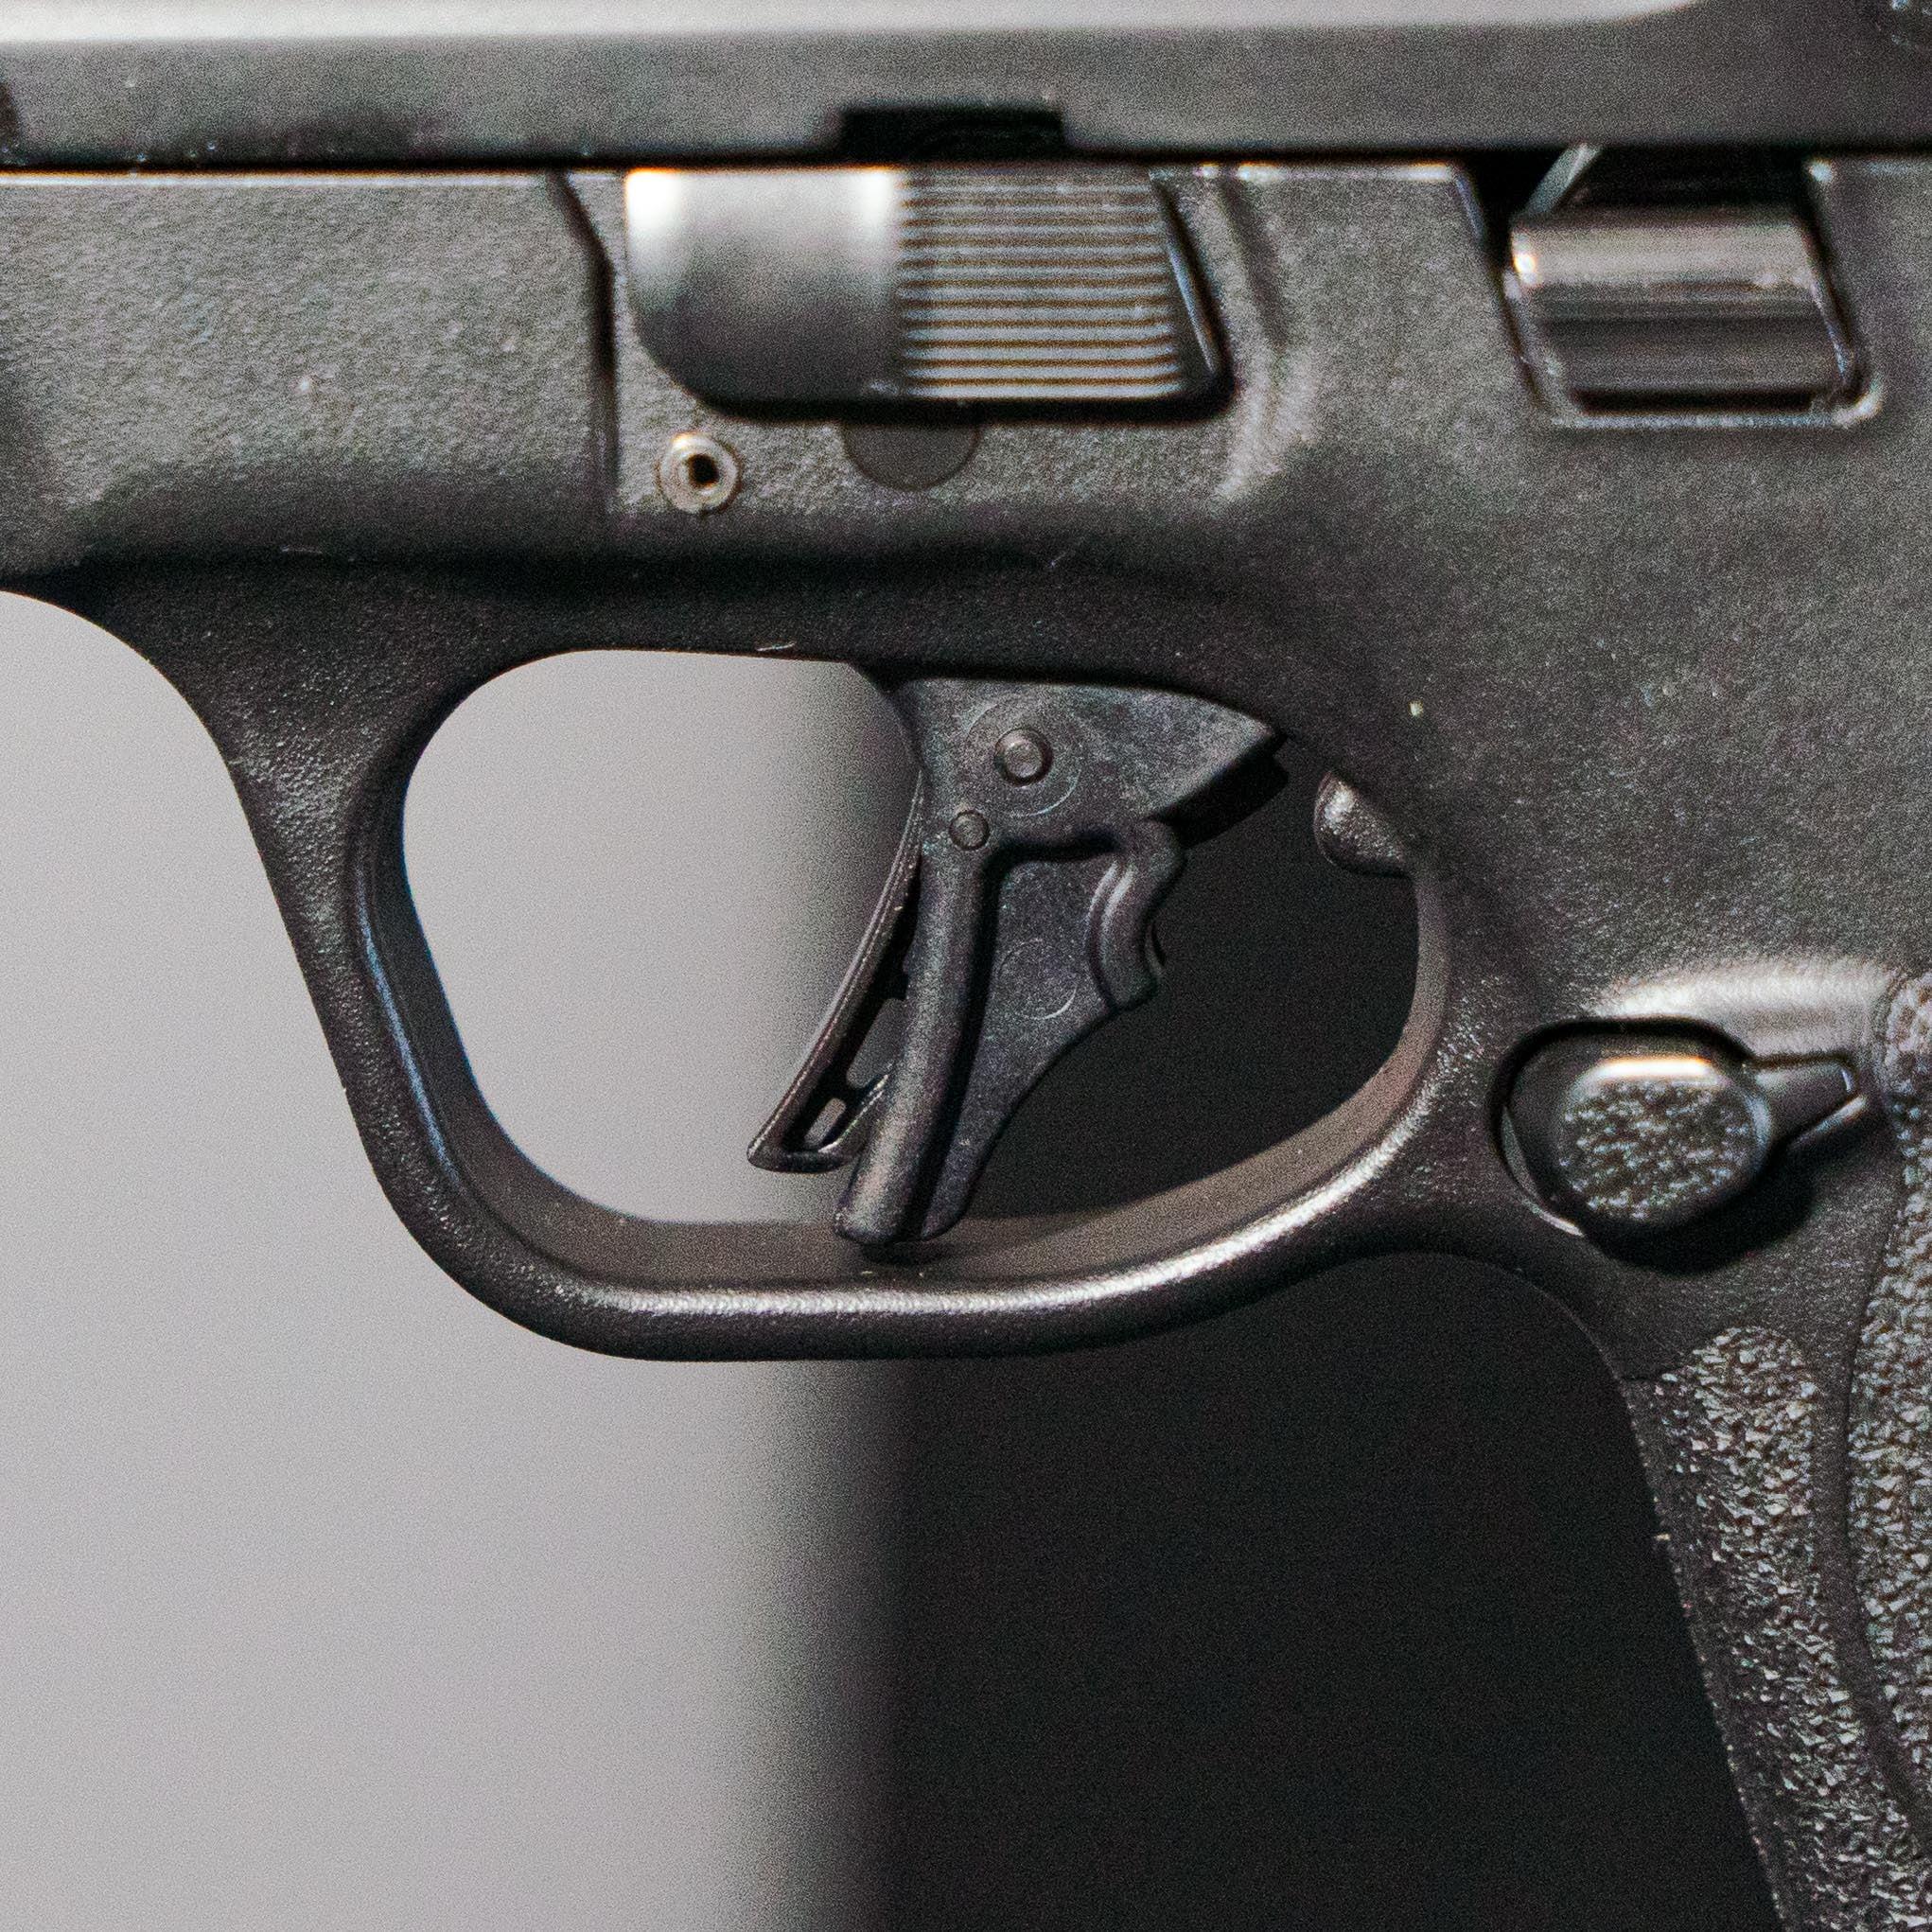 Smith & Wesson M&P 9 Shield Plus Trigger